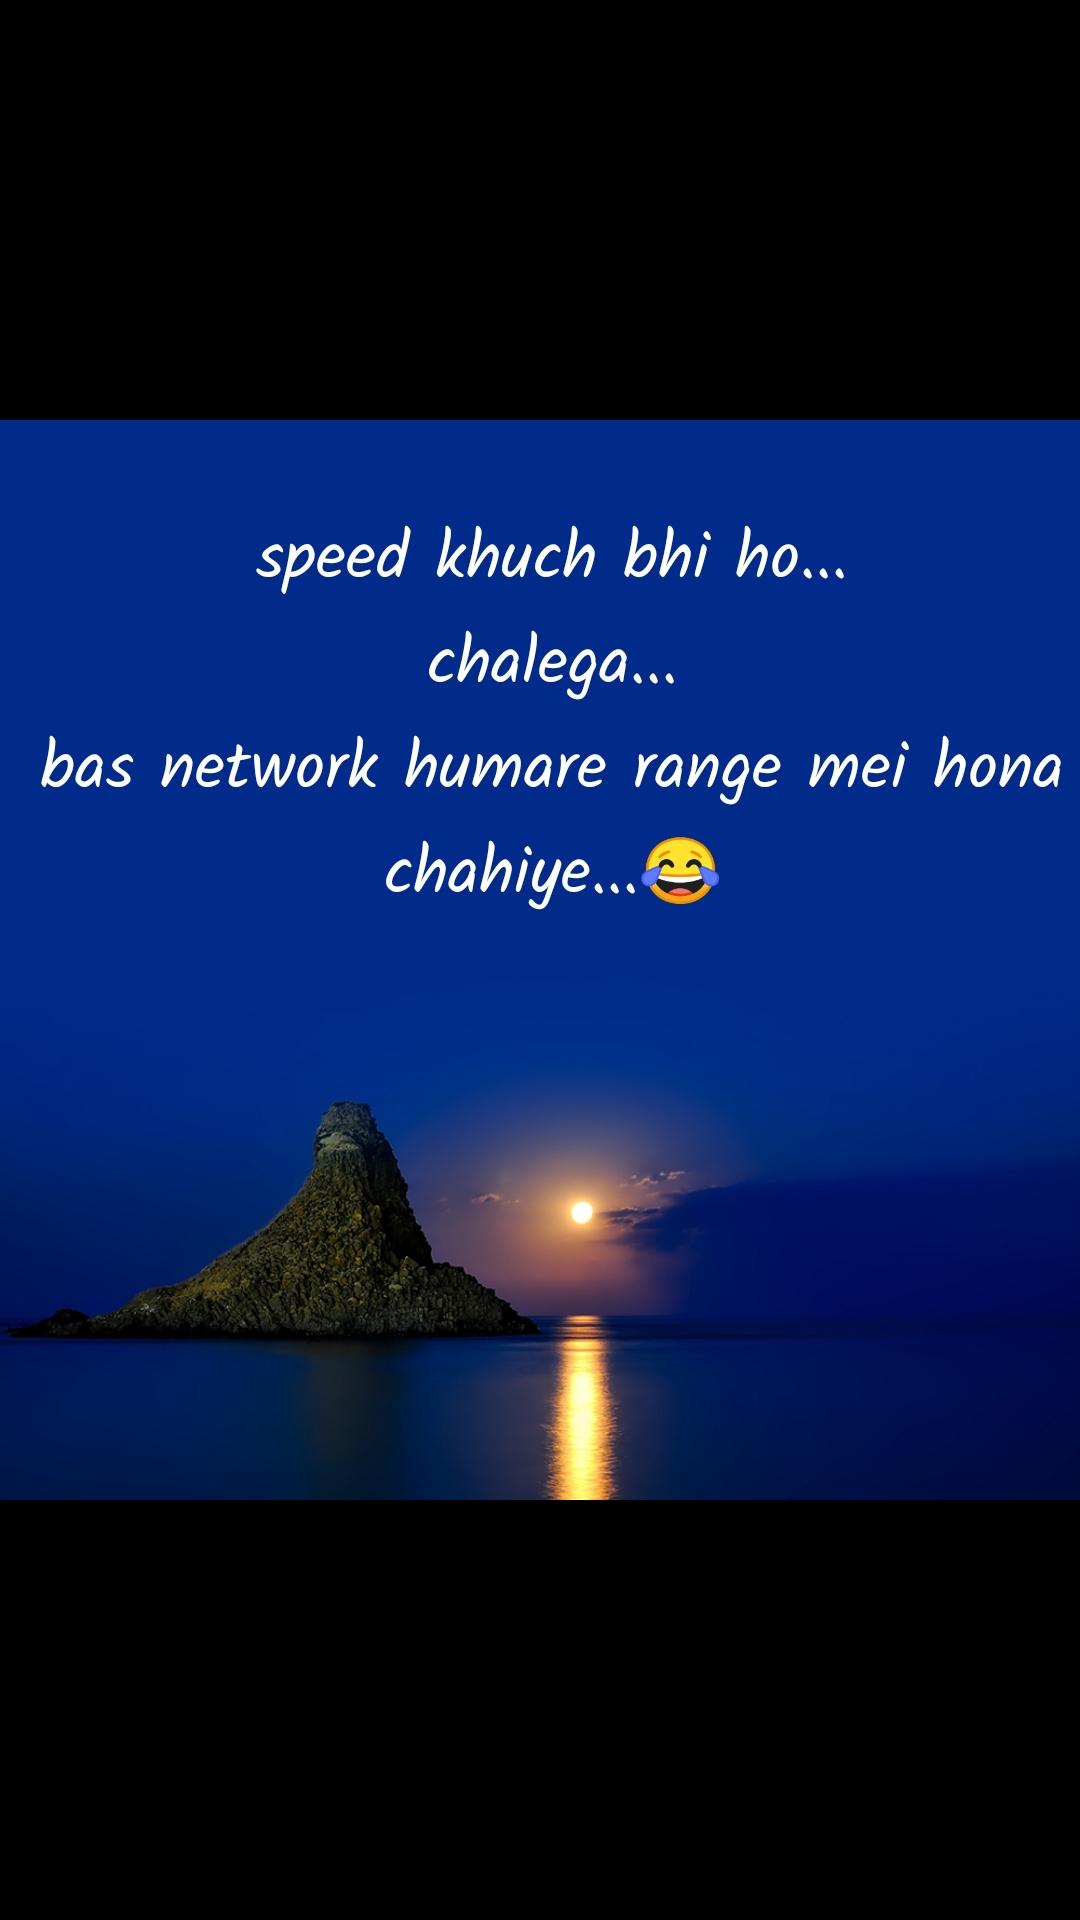 speed khuch bhi ho... chalega... bas network humare range mei hona chahiye...😂